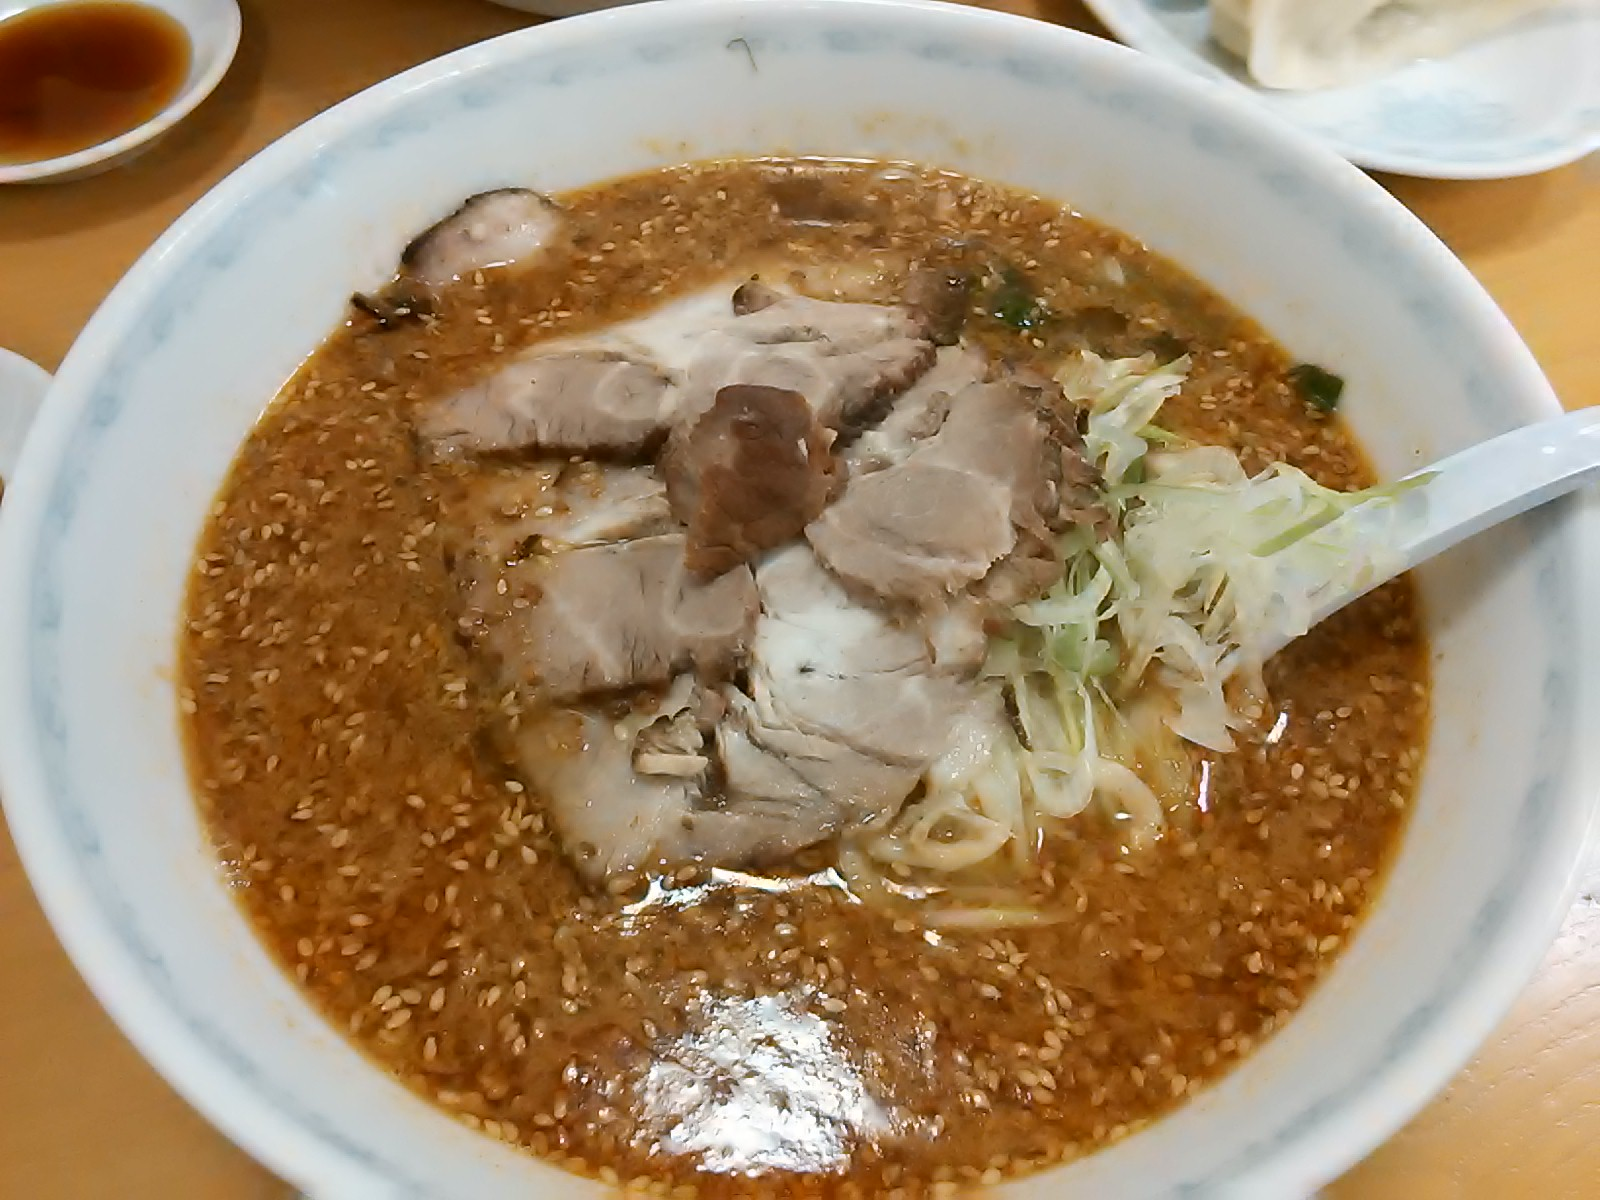 http://doppo.me/site/wp-content/uploads/2016/03/ra-mendaidou.jpg